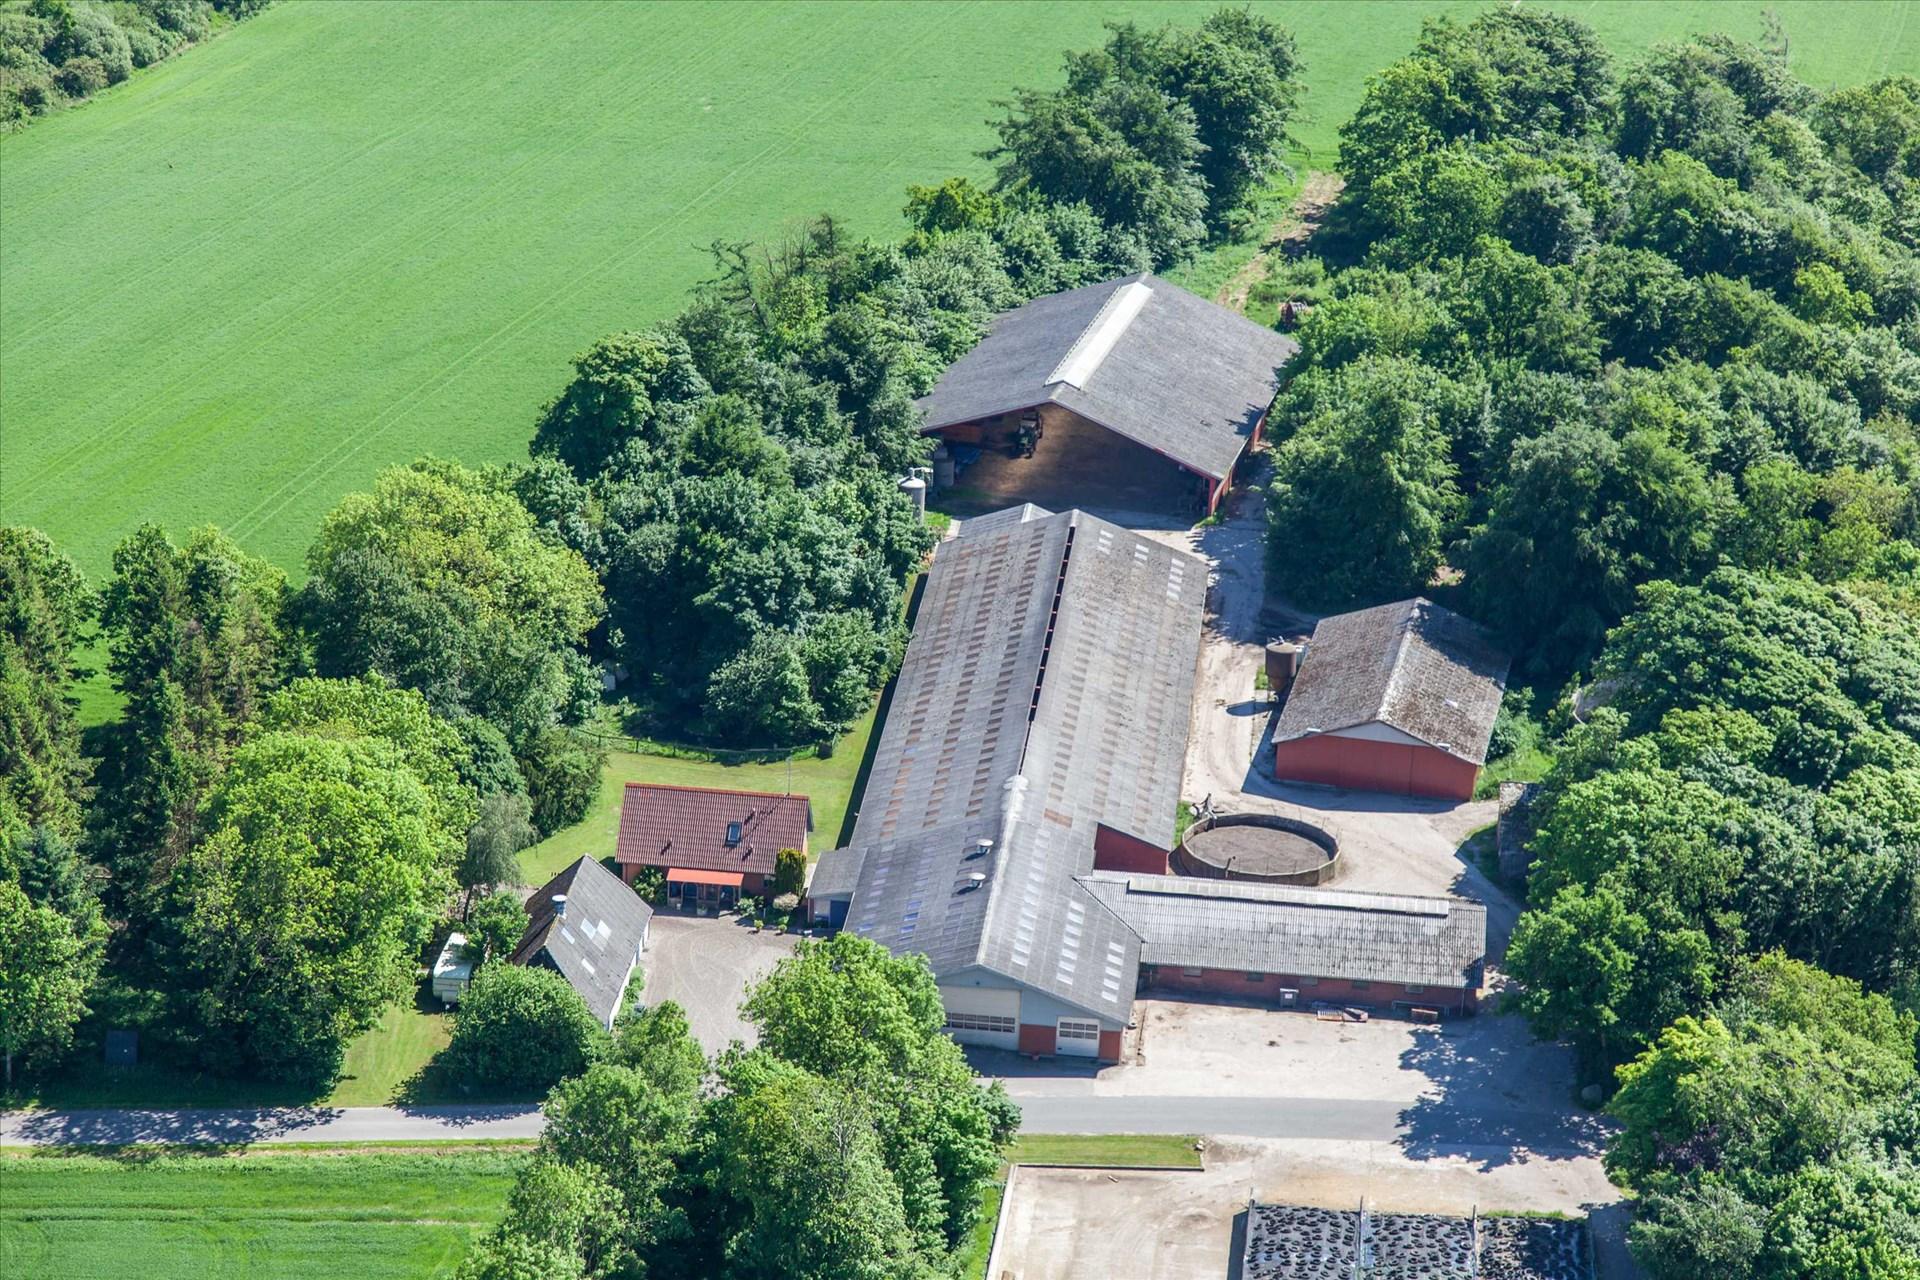 Planteavlsgårde/landbrugsjord til Salg - Gåsblokvej 5, m.fl, 6240 Løgumkloster